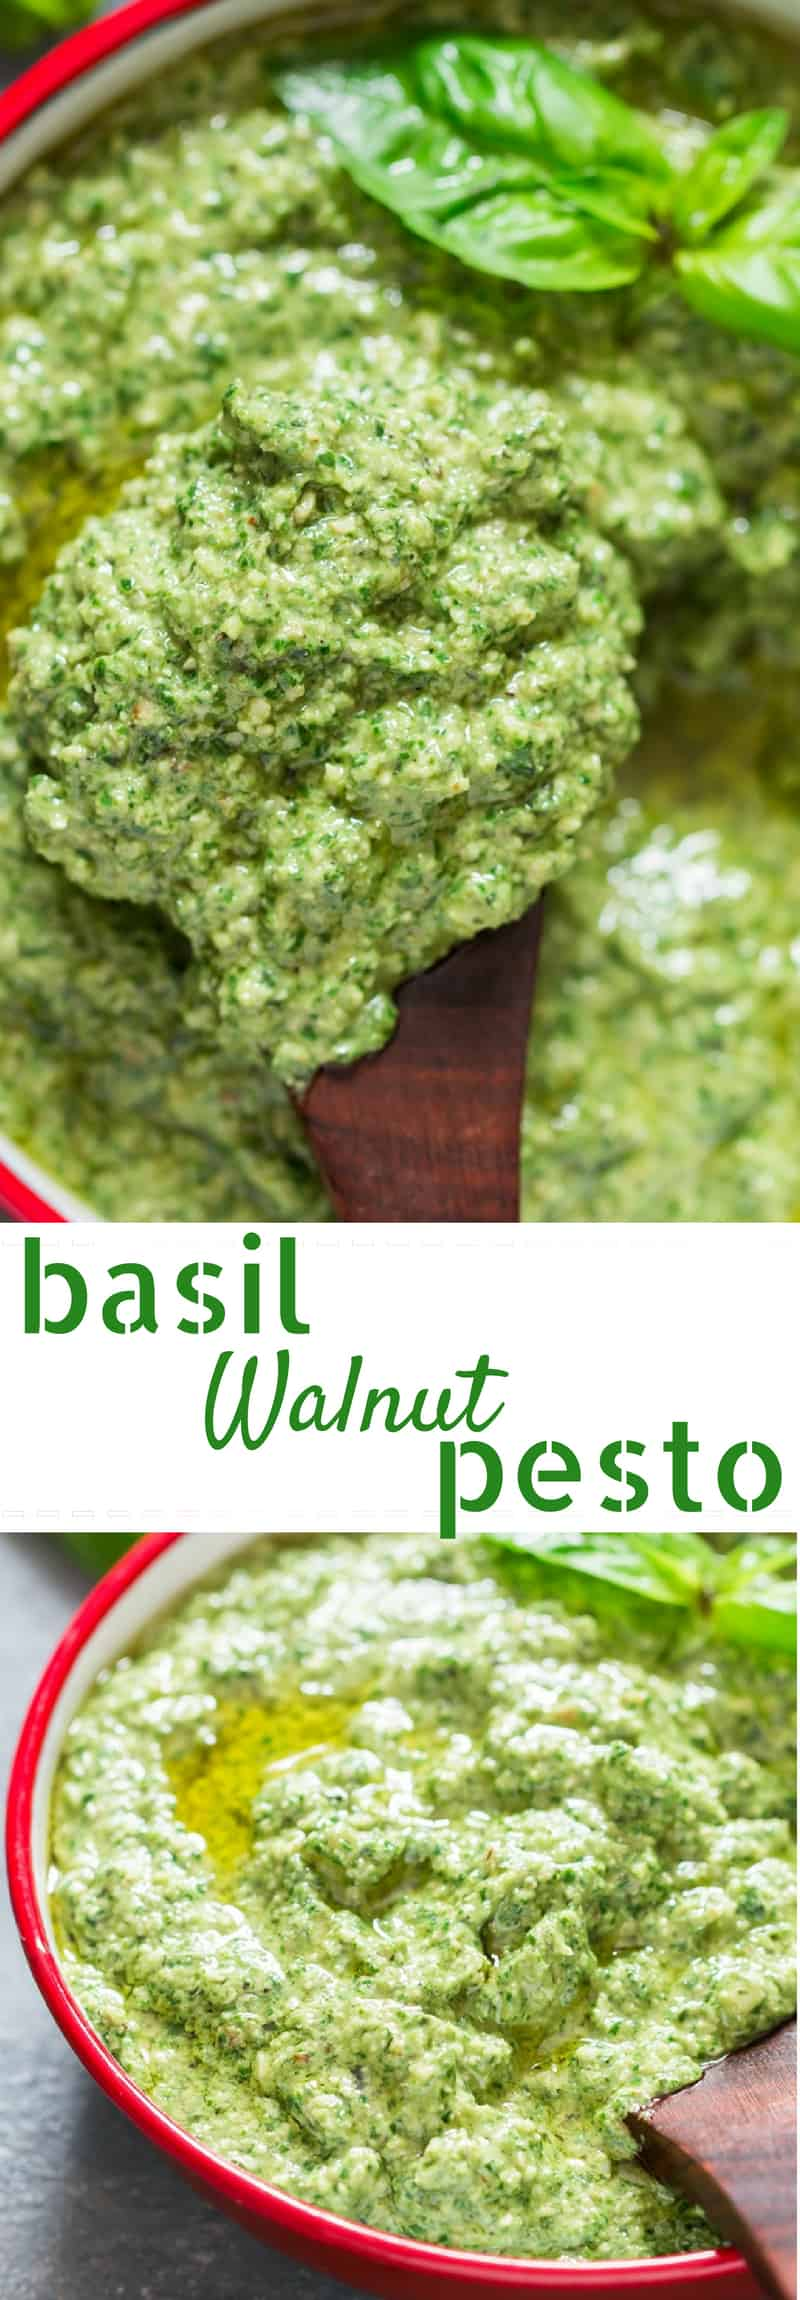 healthy vegan basil walnut pesto in white bowl